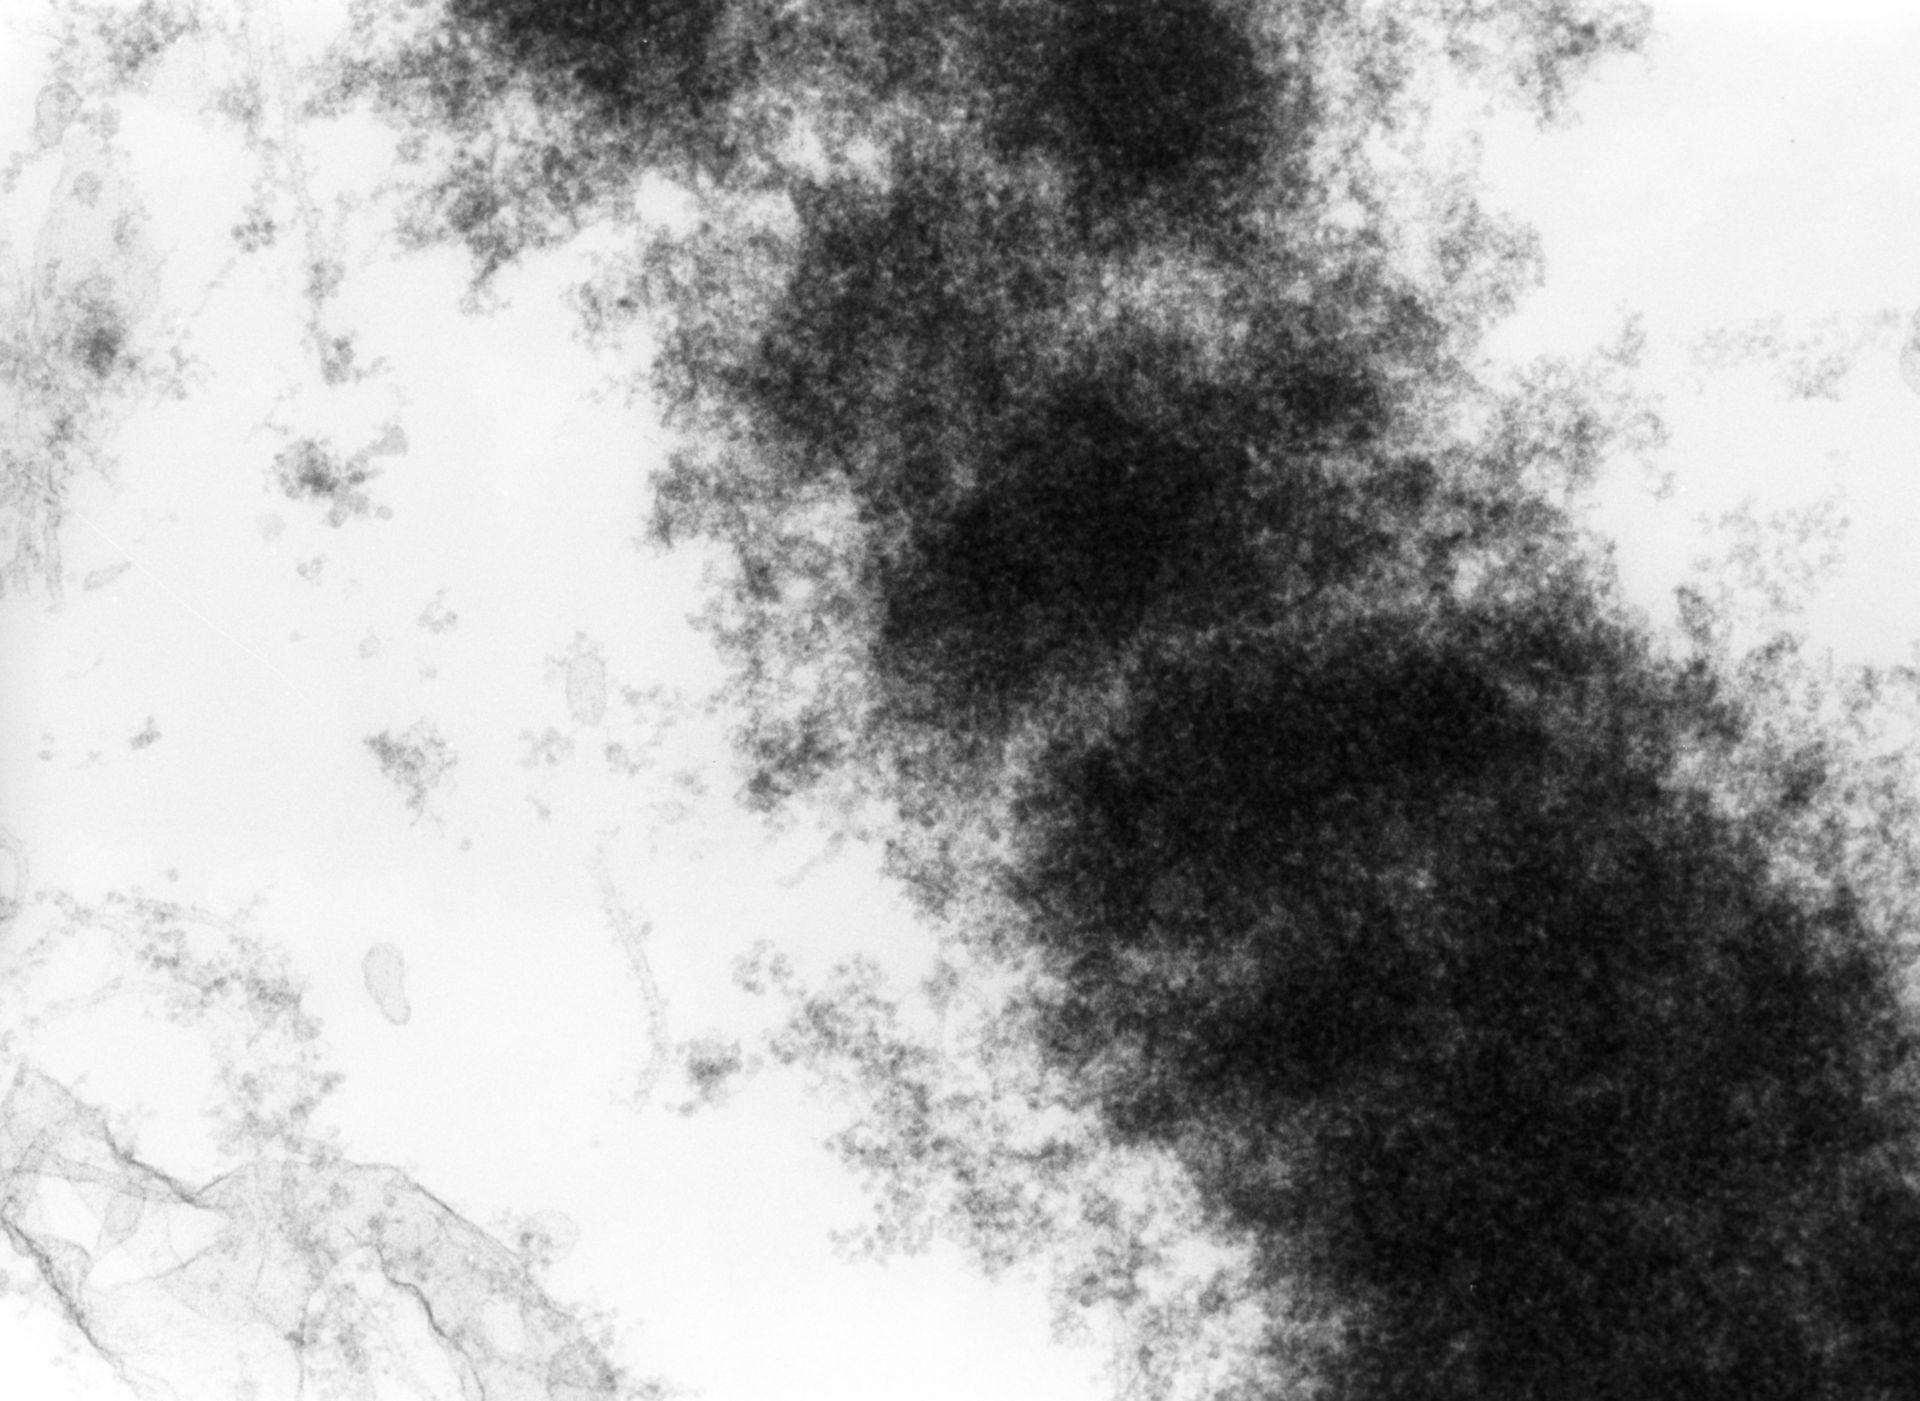 Haemanthus katharinae (Nuclear chromosome) - CIL:11905